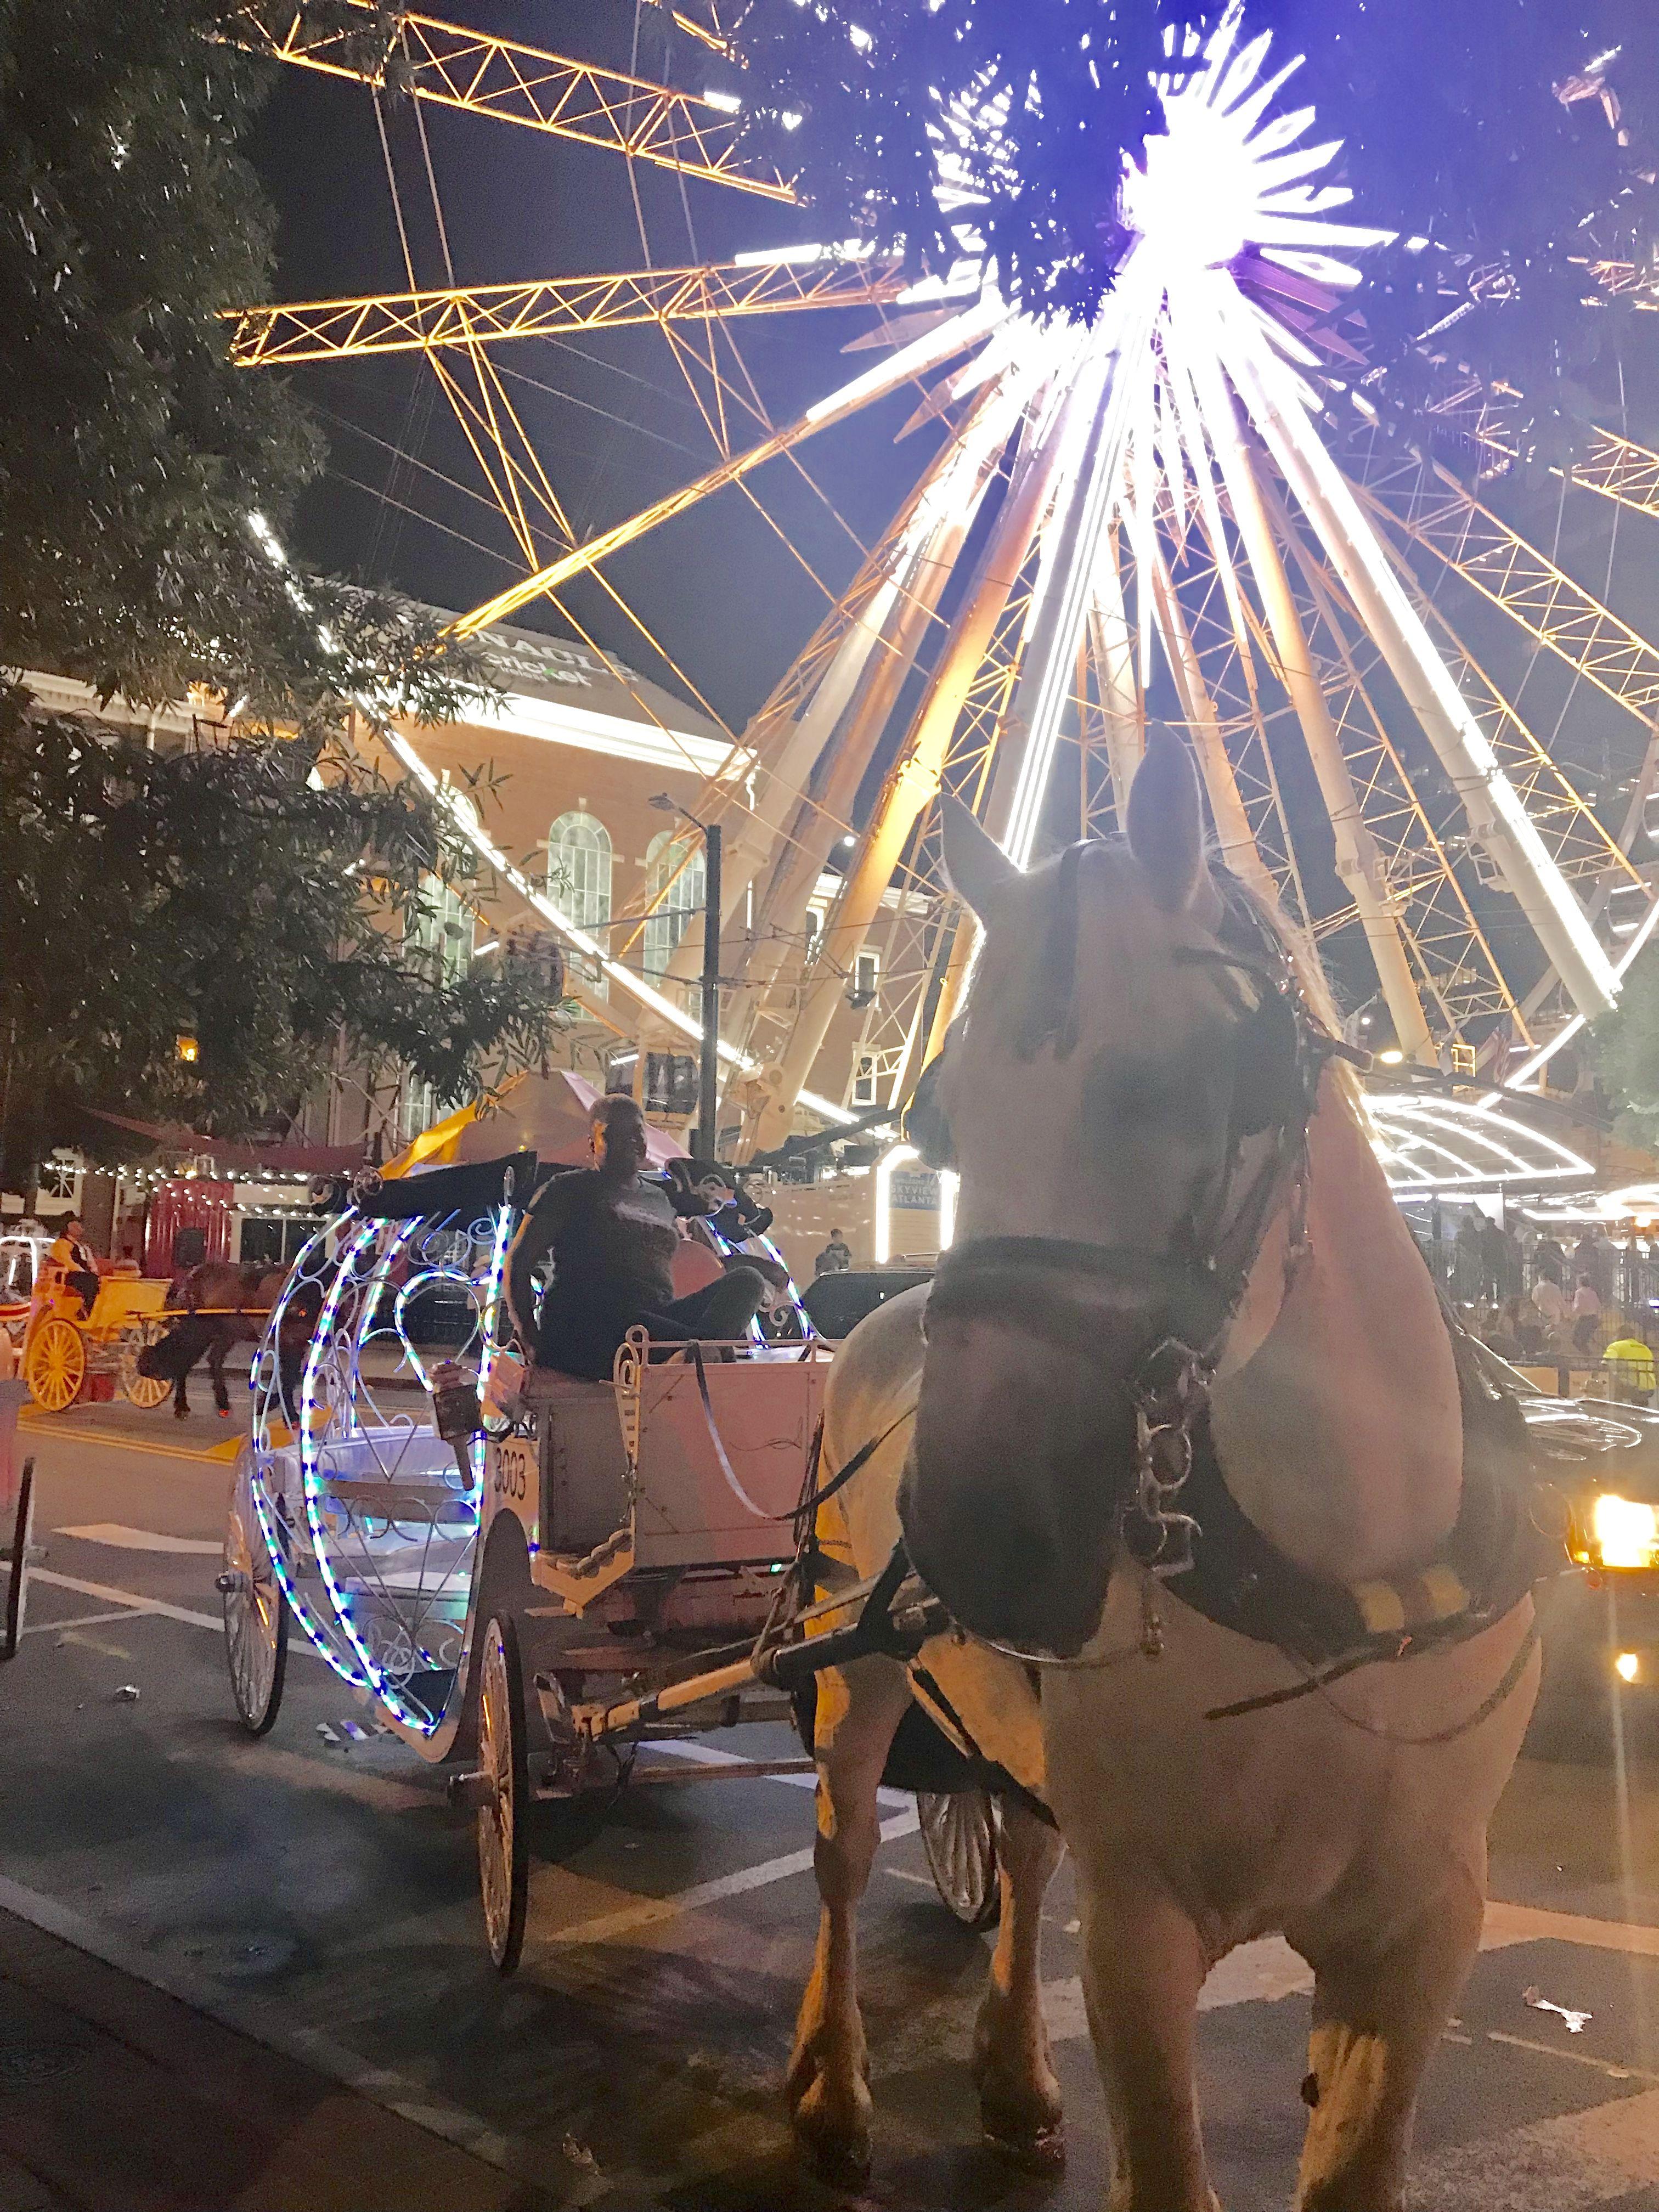 Skyview Ferris Wheel downtown Atlanta horse and